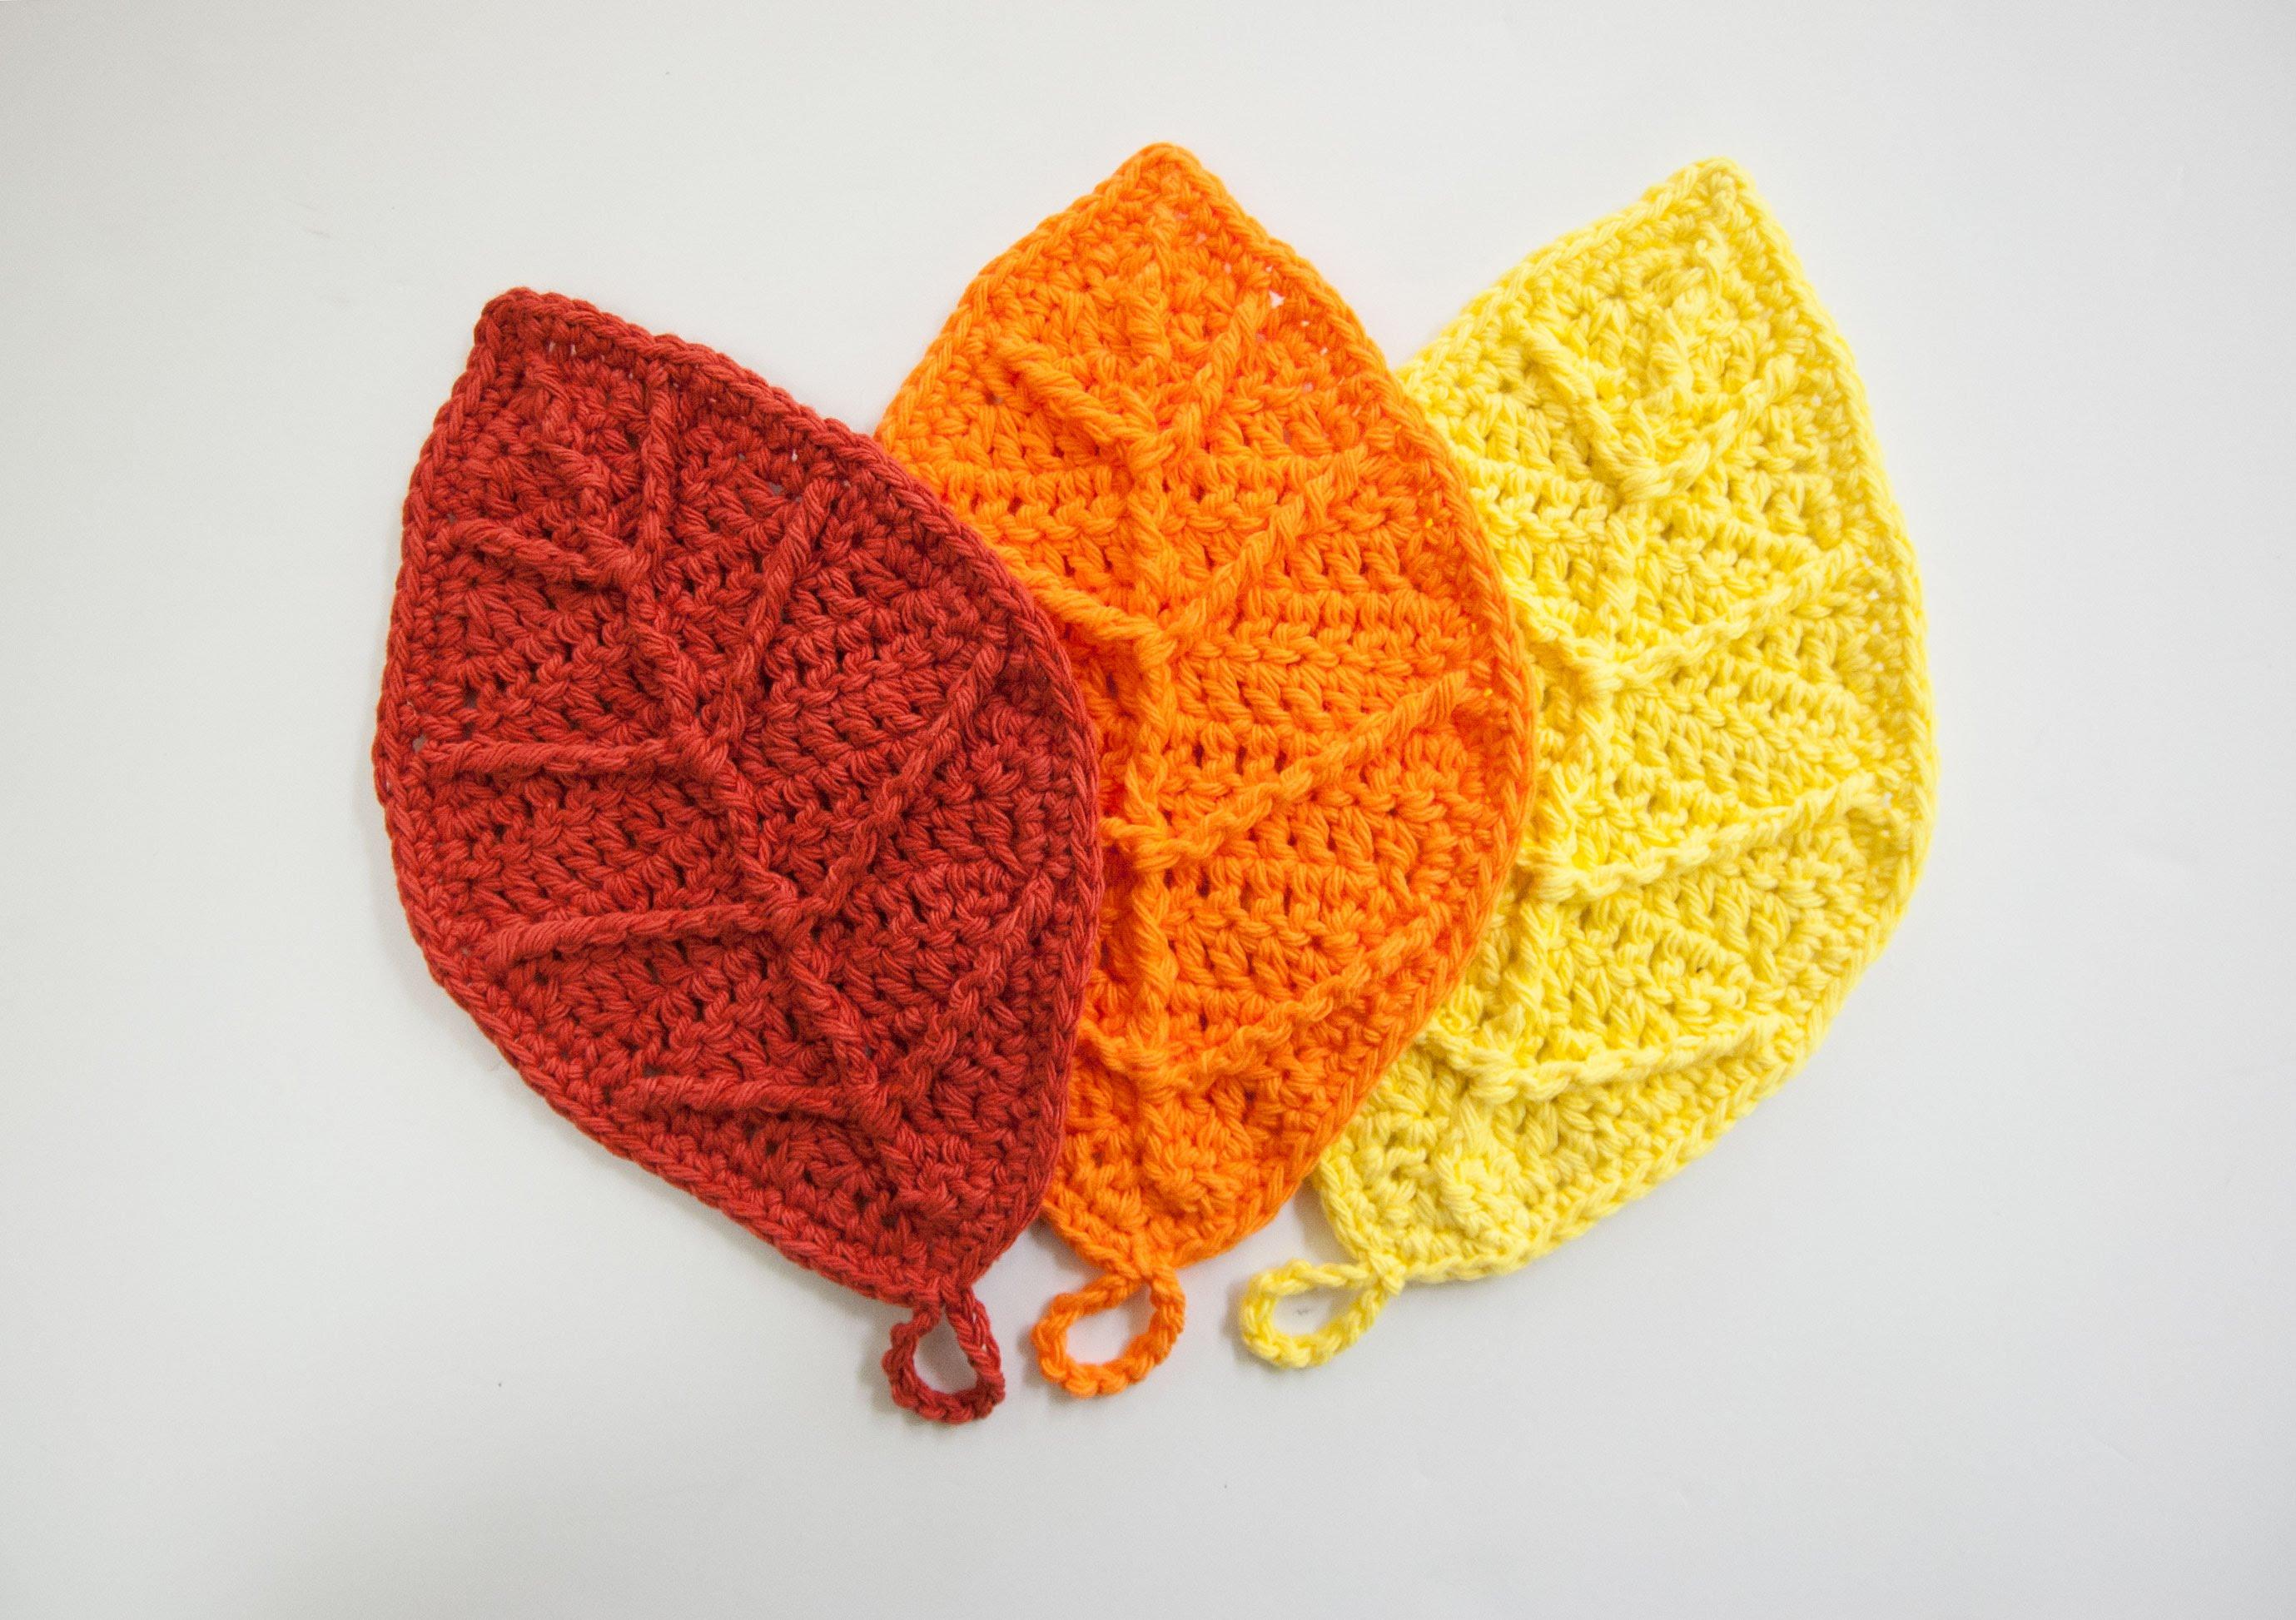 Autumn leaf photo